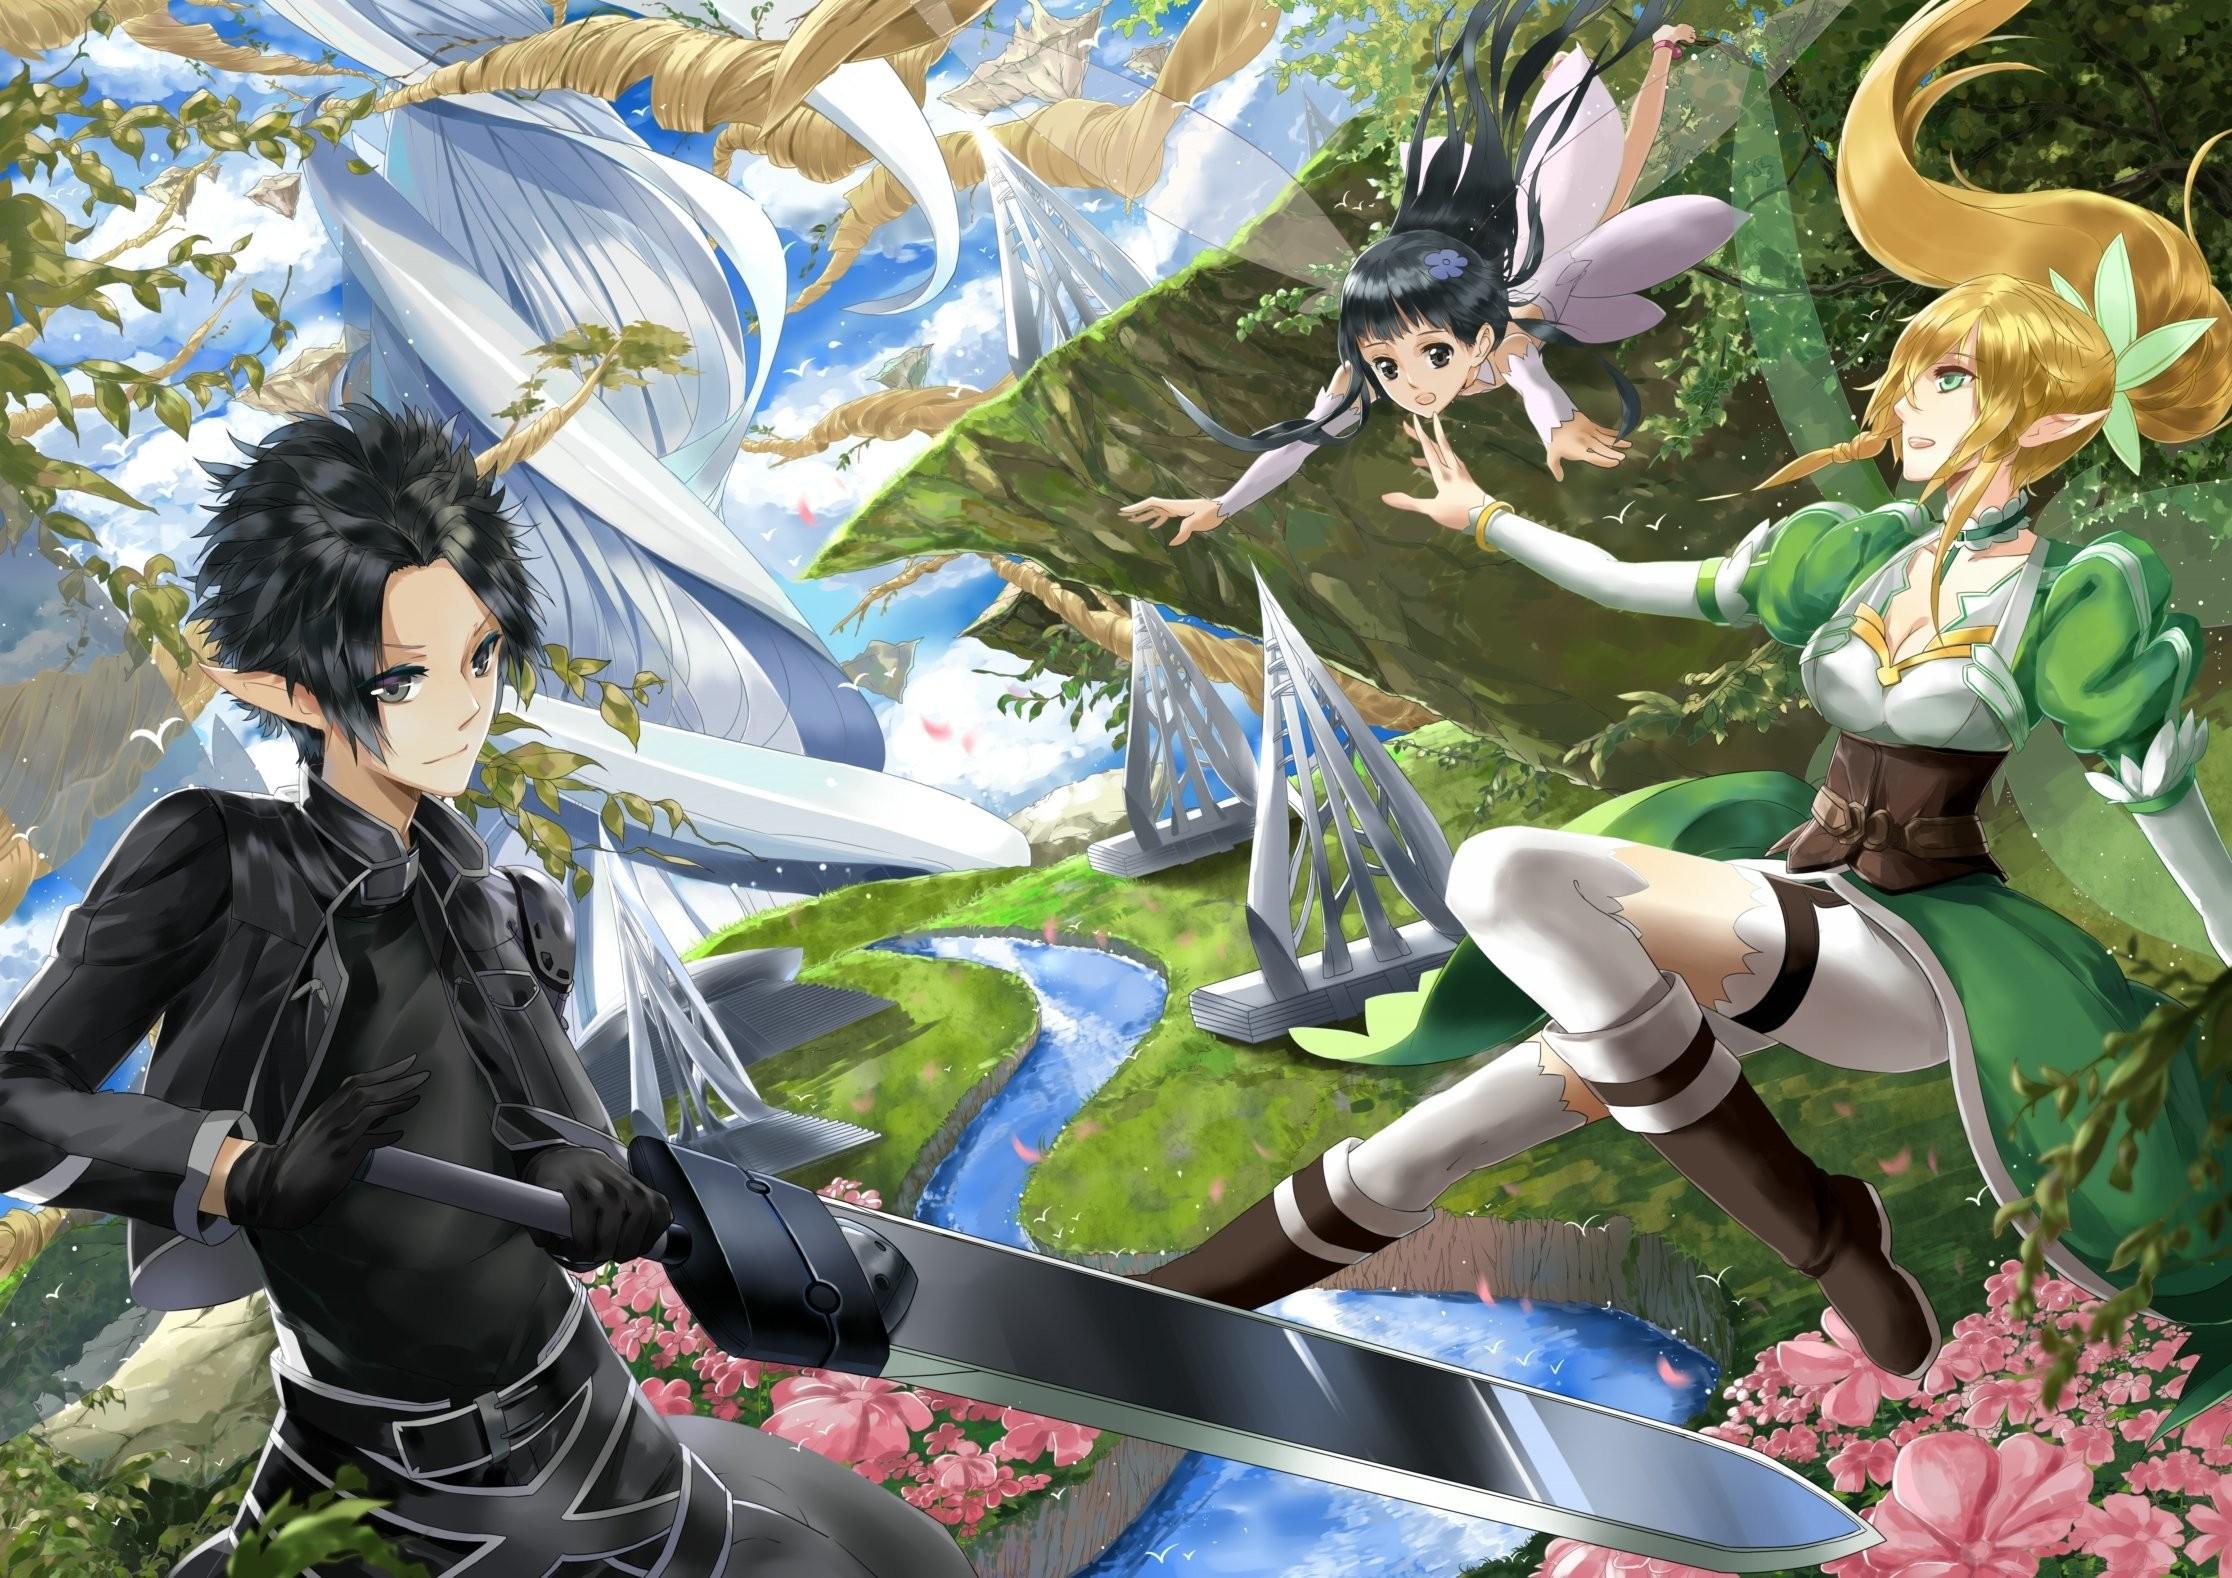 Forest weapon sao Elves sword swordsman online Fairy Yggdrasil Yui river  Flowers alo Kirito Bodice Trees wallpaper | | 495592 | WallpaperUP